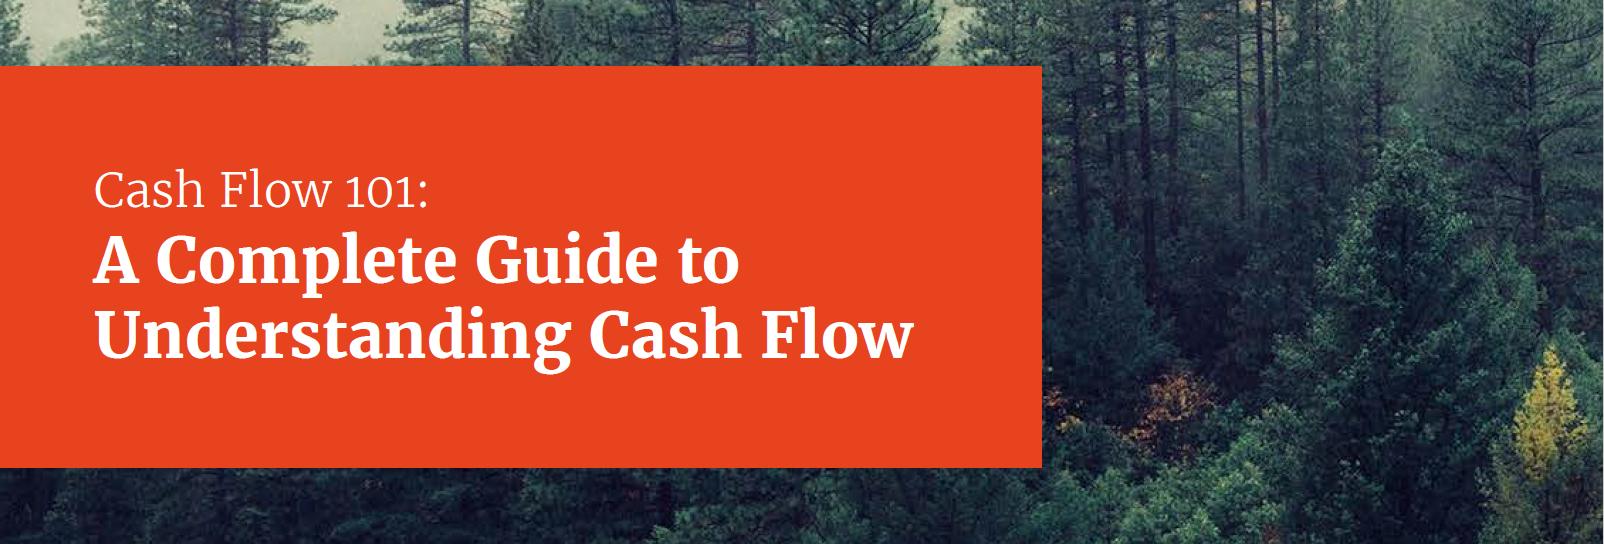 Cash Flow 101: A Complete Guide to Understanding Cash Flow